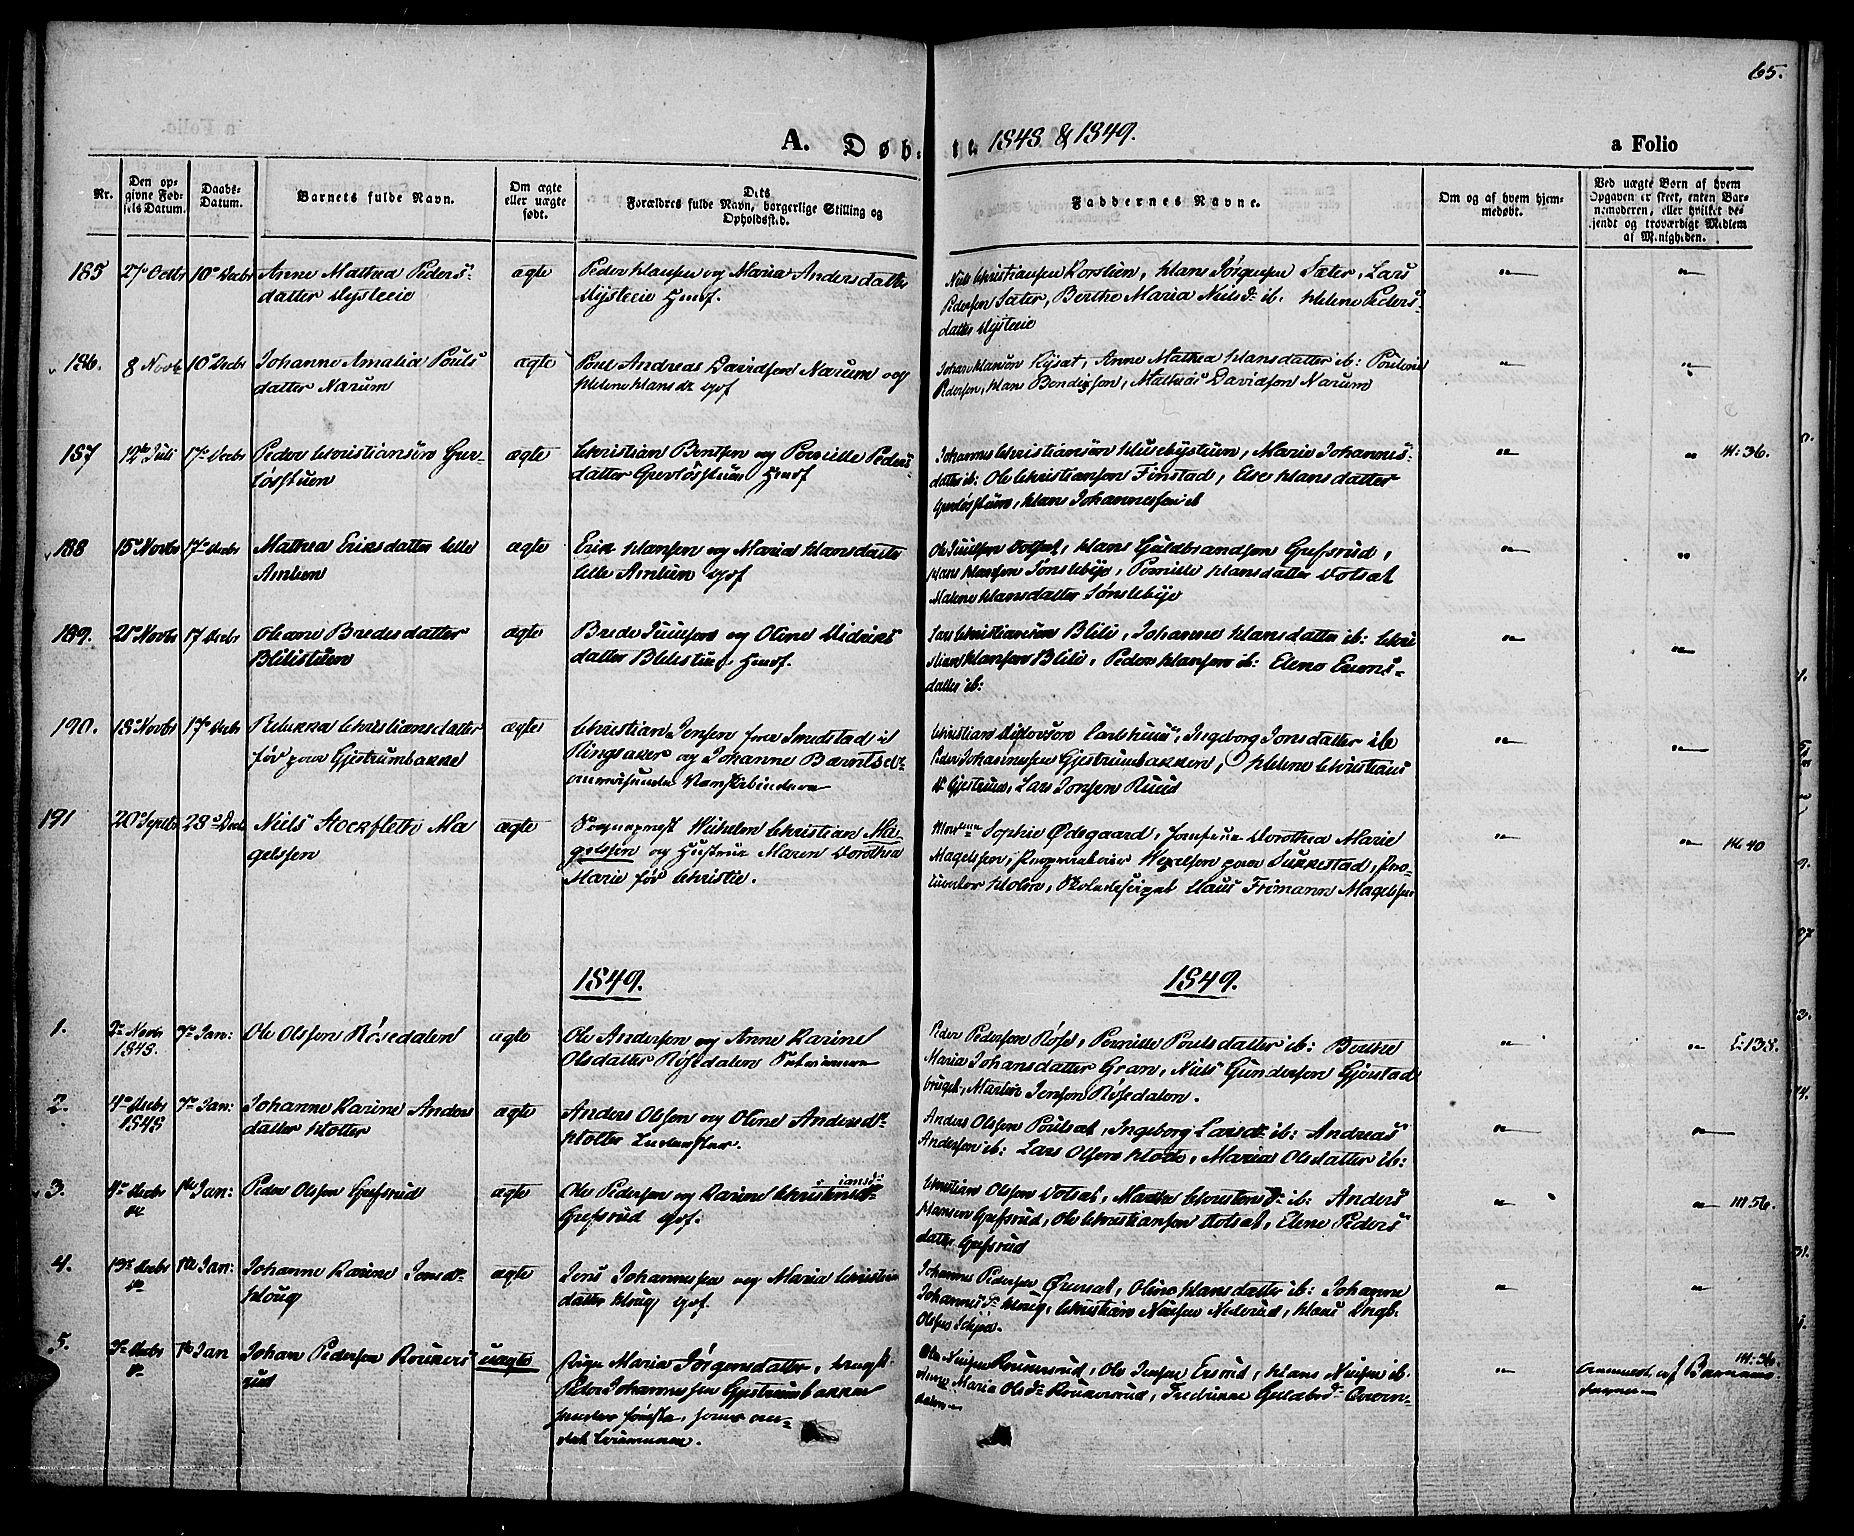 SAH, Vestre Toten prestekontor, H/Ha/Haa/L0004: Ministerialbok nr. 4, 1844-1849, s. 65